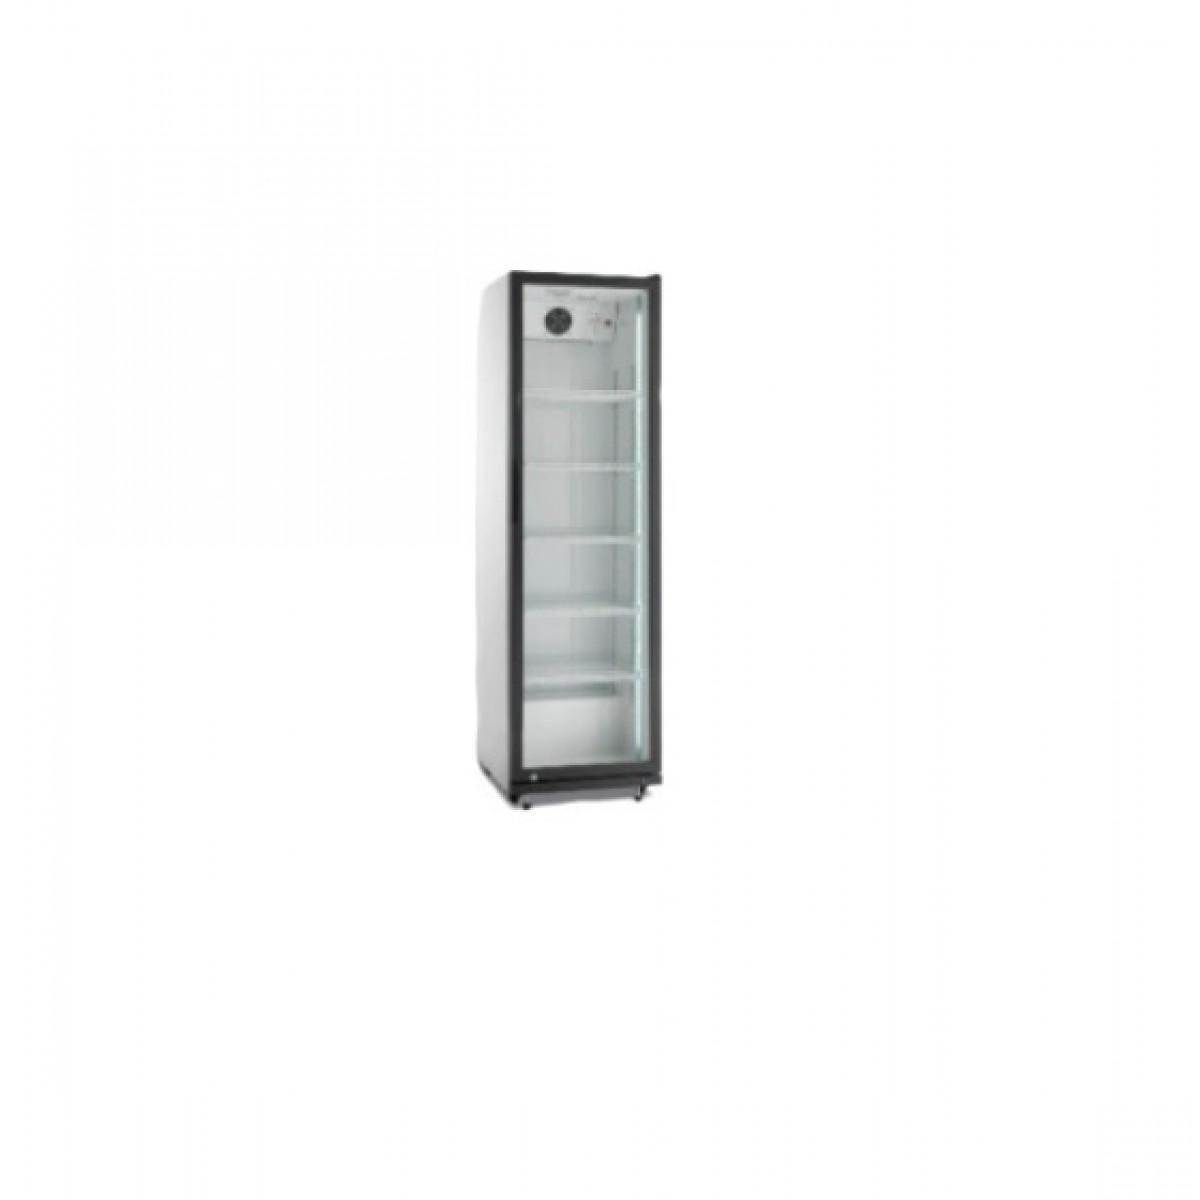 WINSTAR SD 429-1 Ψυγείο βιτρίνα συντήρηση 394Lt Ψυγεία μονόπορτα Ηλεκτρικες Συσκευες - homeelectrics.gr